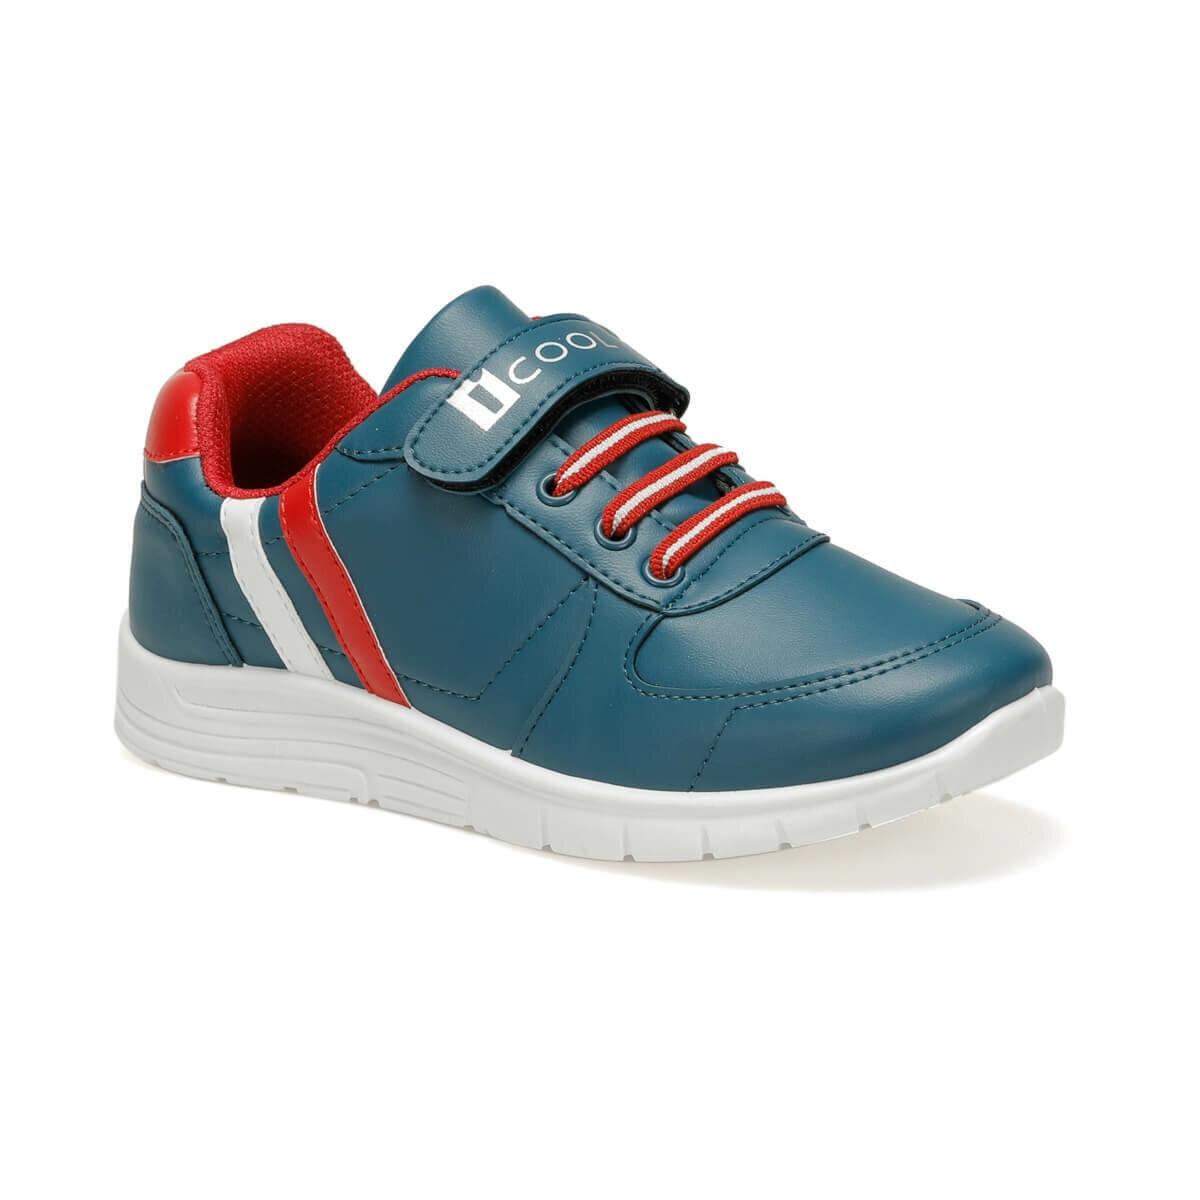 FLO DEMBA.2 Oil Male Child Sneaker I-Cool